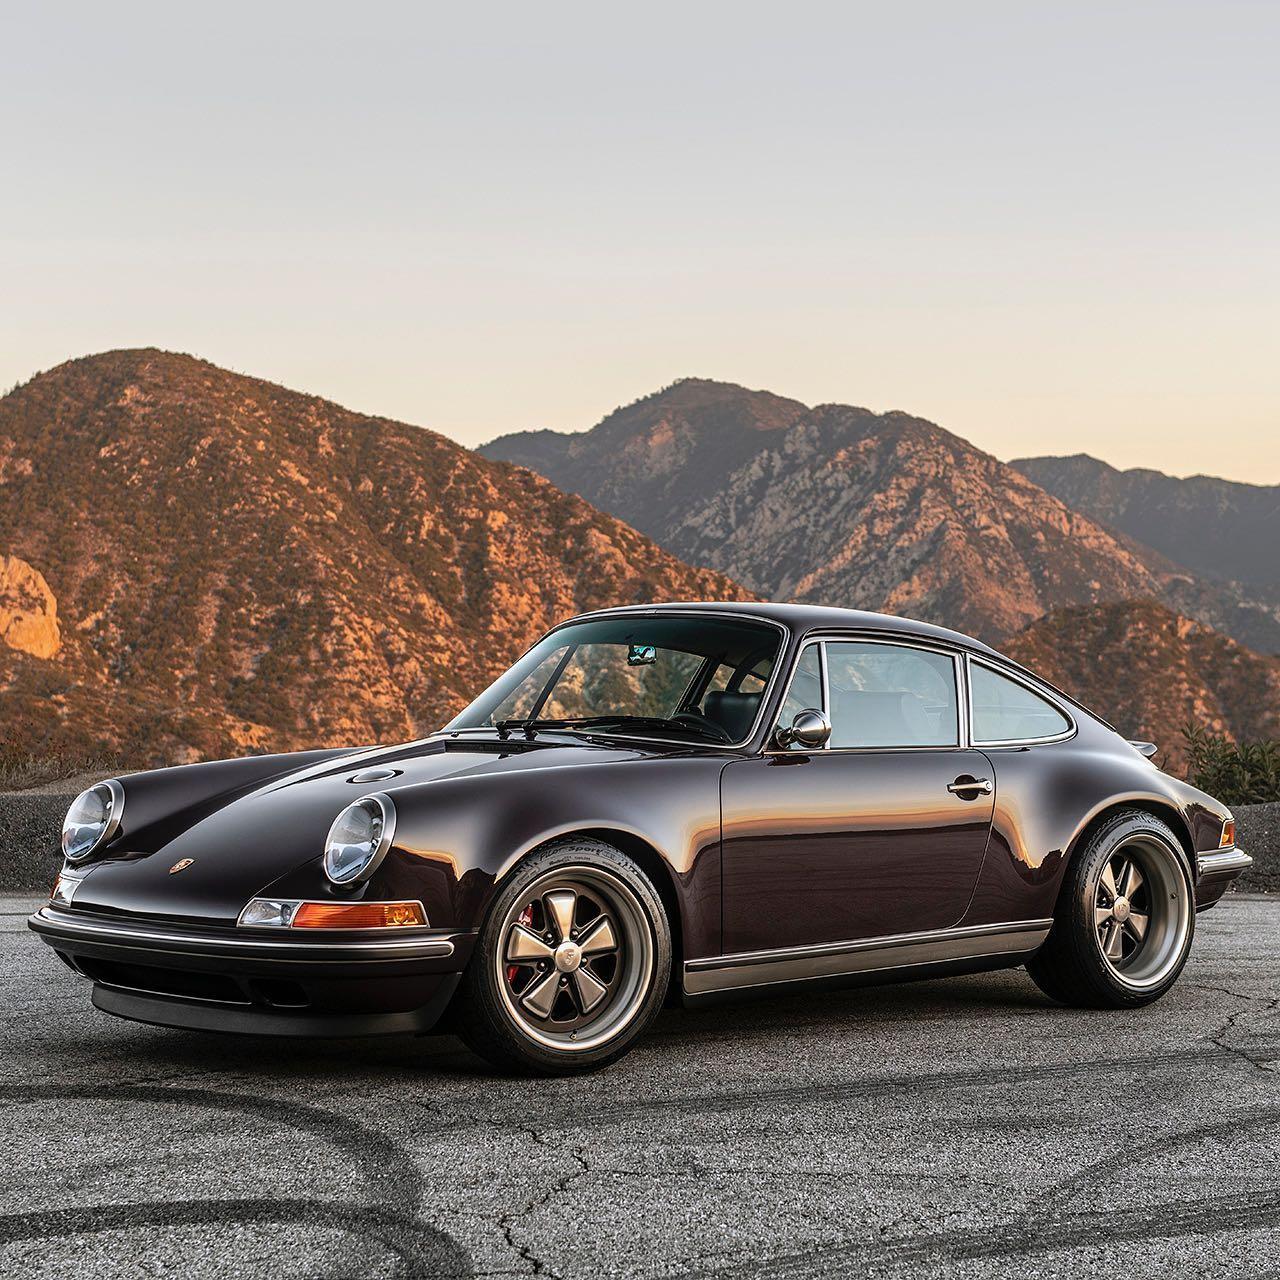 Singer_Anglet_Commission_Porsche_911_0000